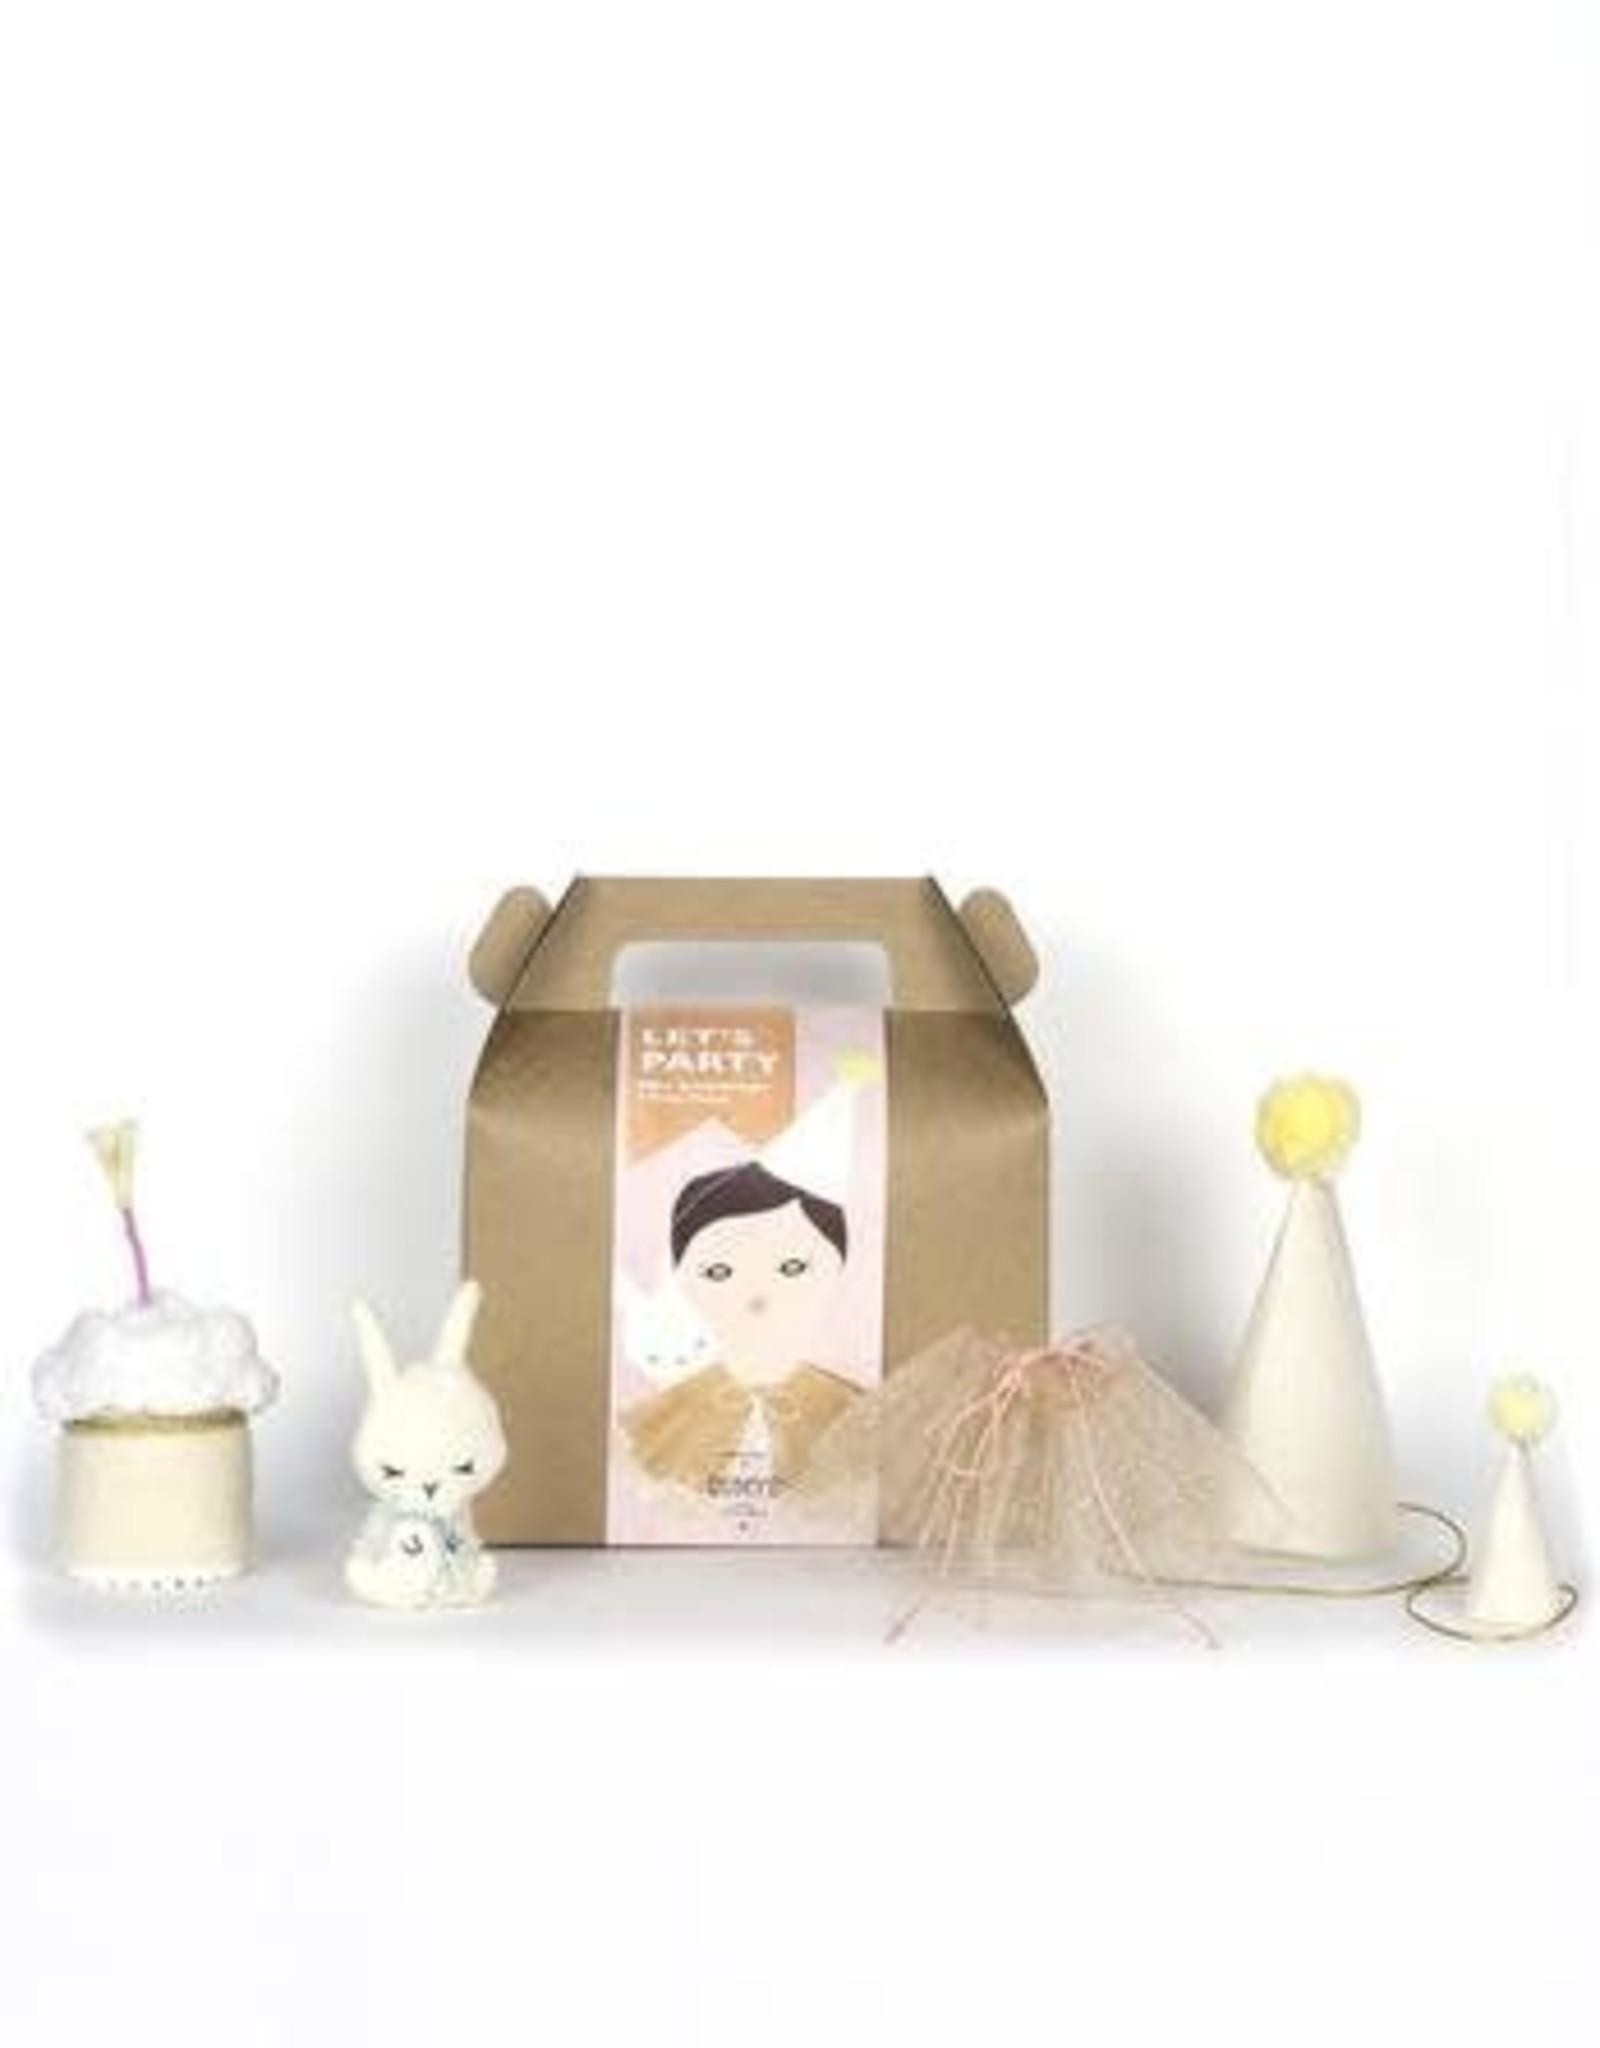 "Dumye ""Let's Party"" - Doll Accessory Kit"